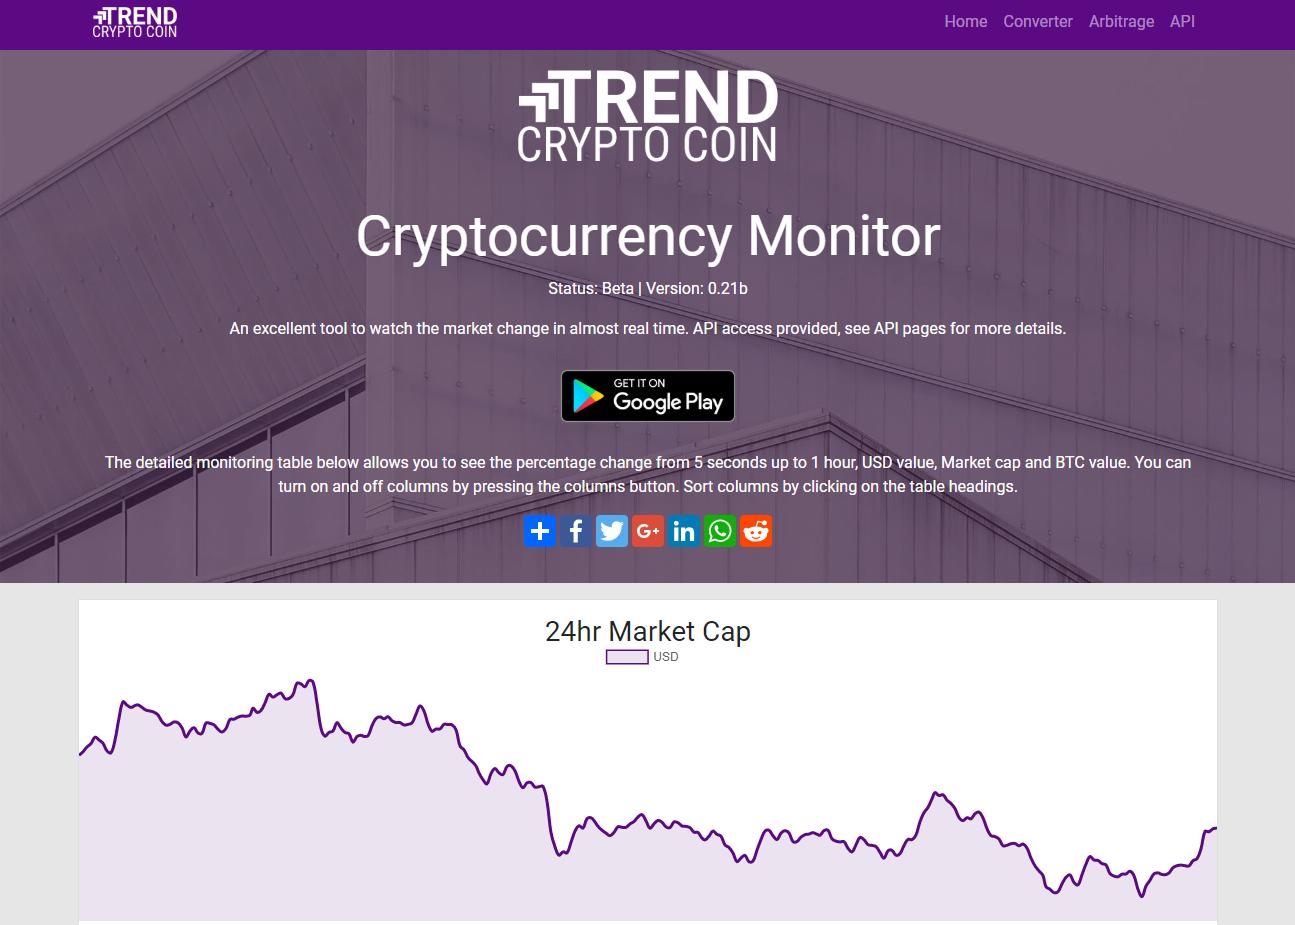 Trend Crypto Coin